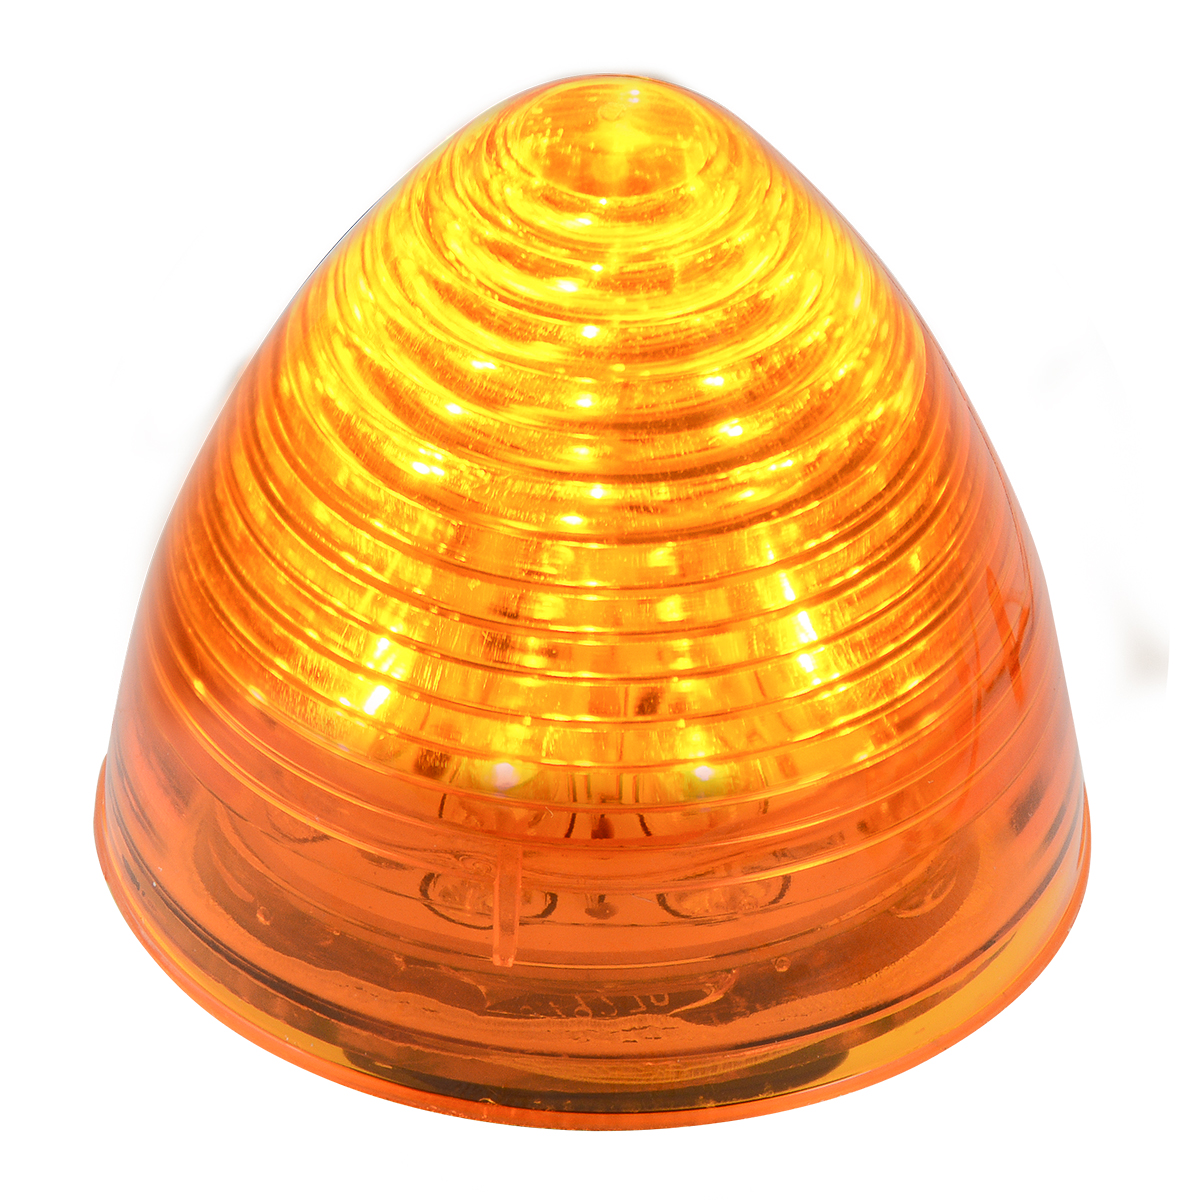 "#79270 2"" LED Beehive Amber/Amber Light"